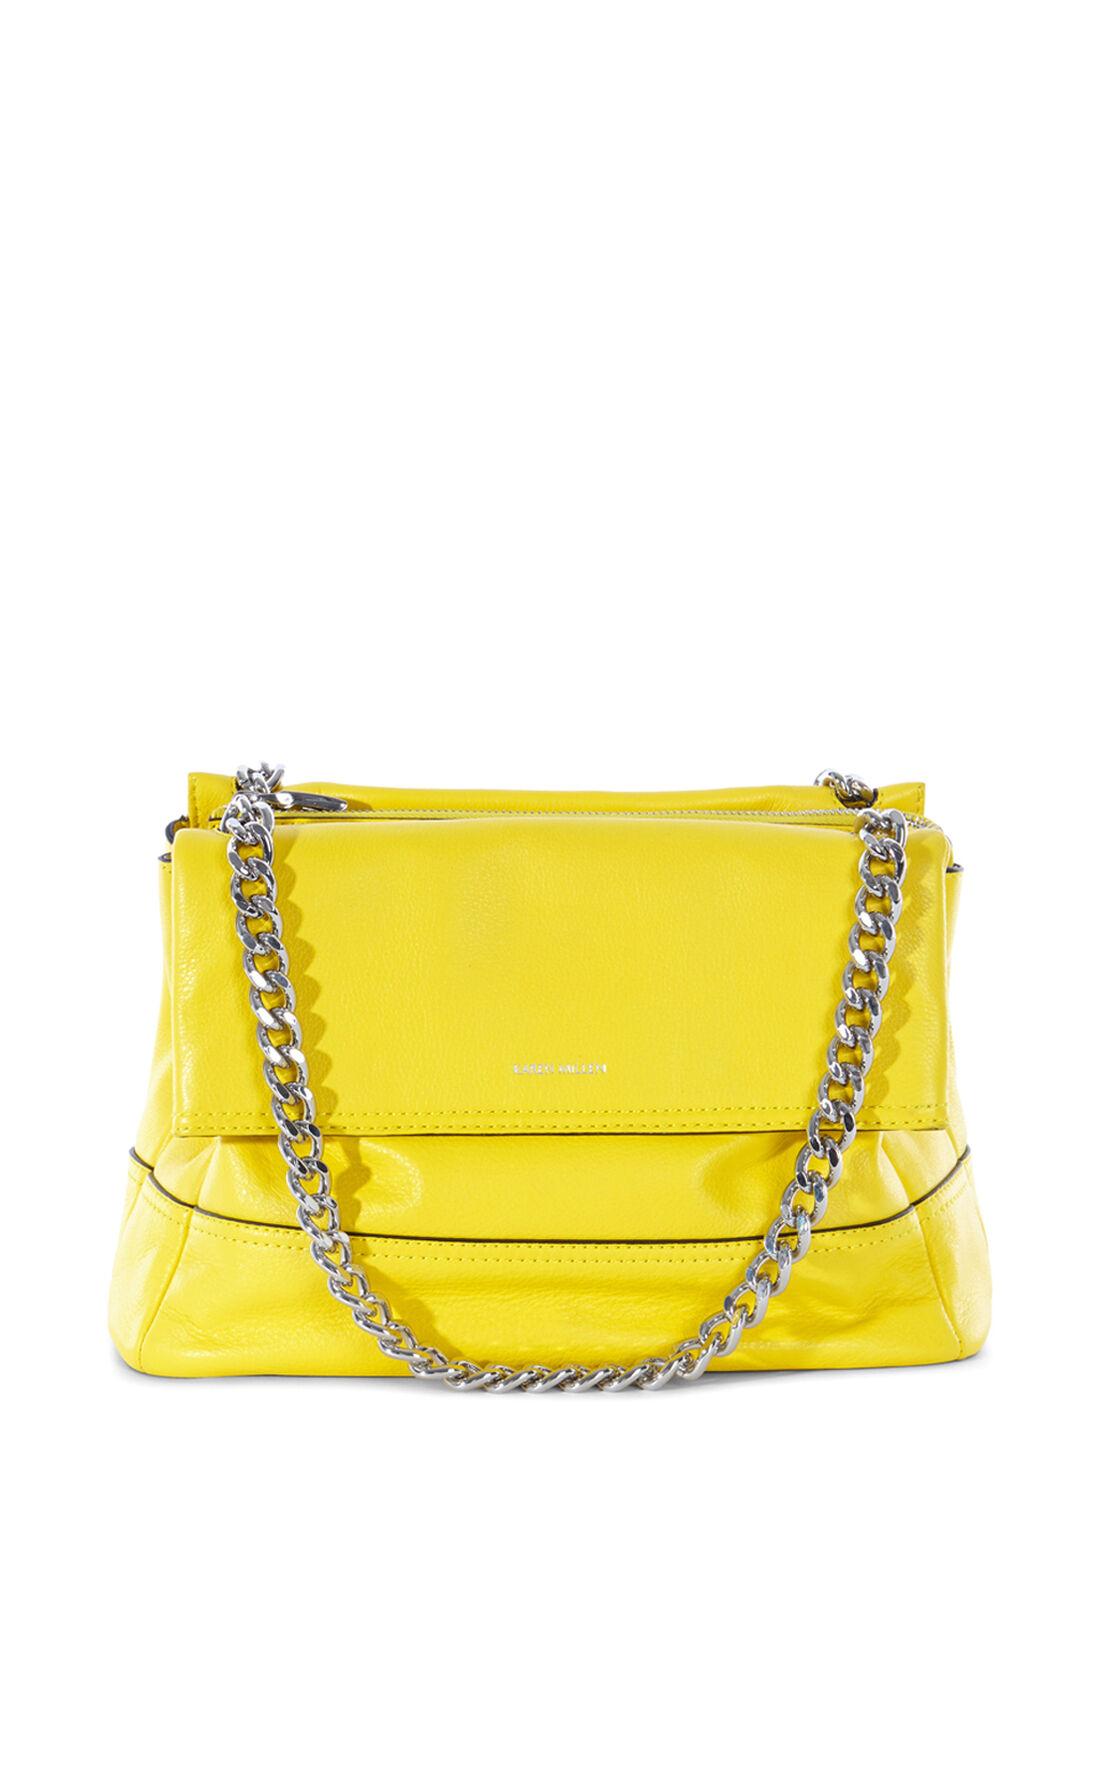 Karen Millen, SANTA MONICA LEATHER BAG Lime 0